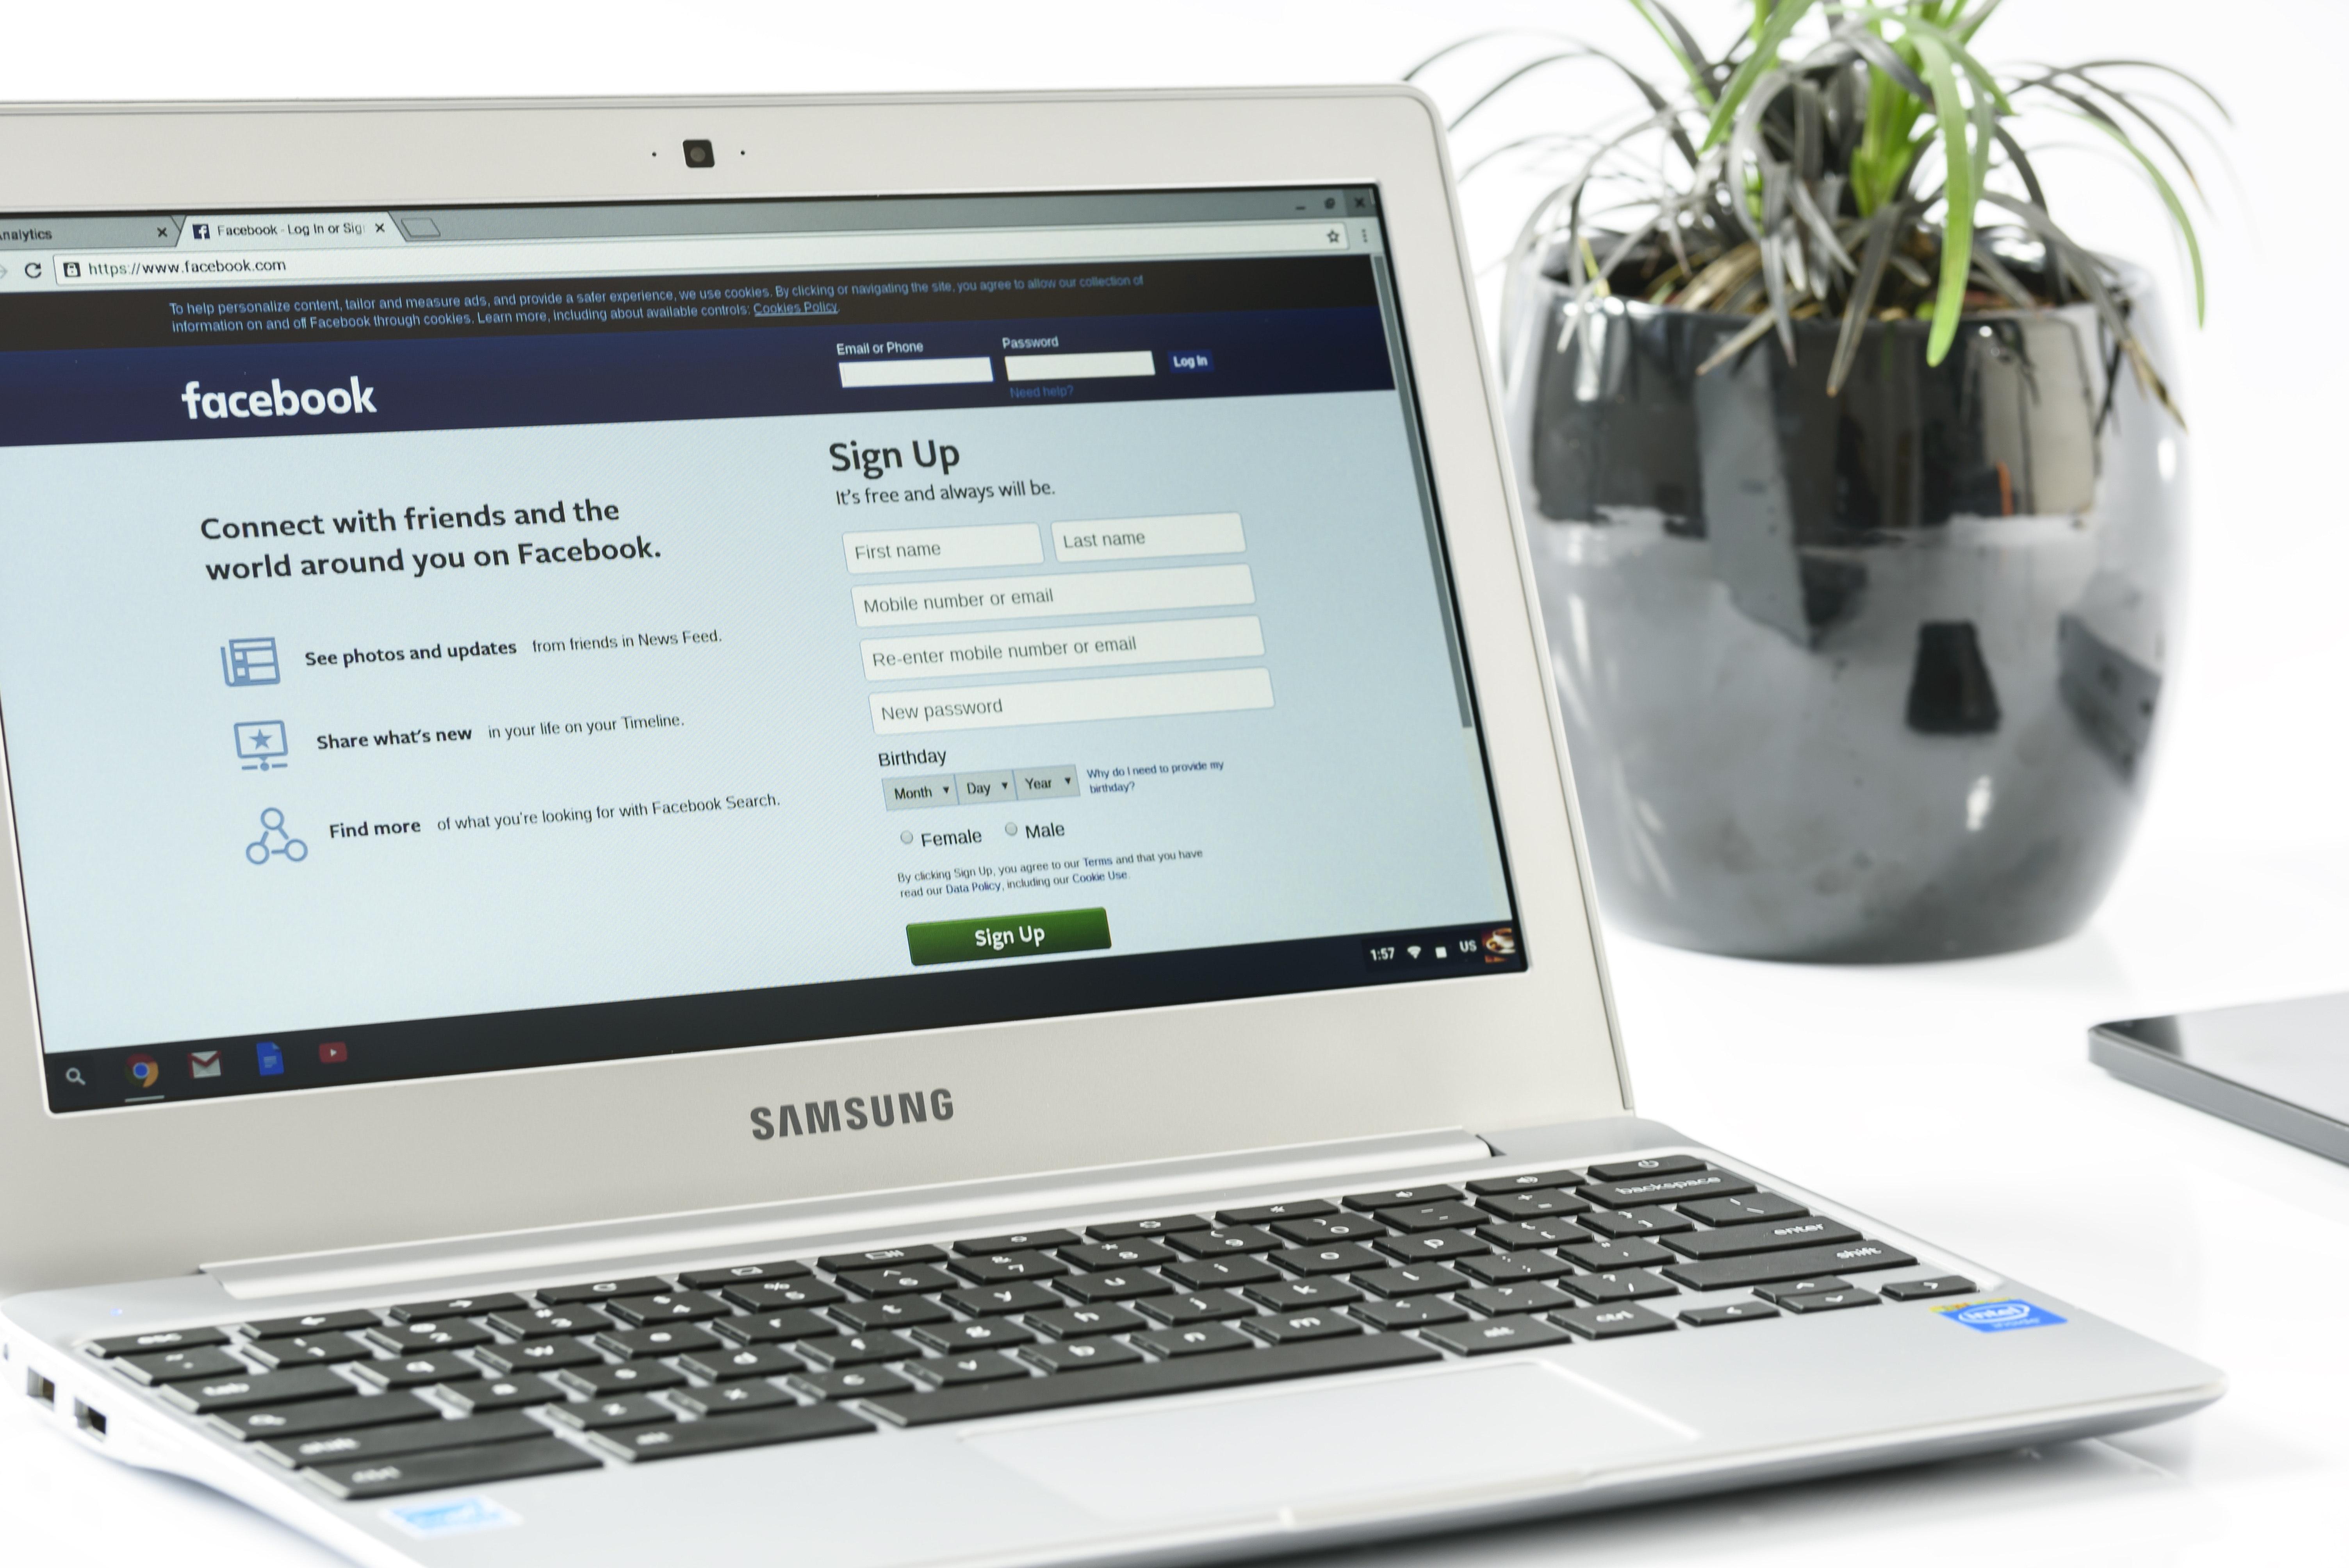 Facebook afecta a la Salud Mental… e igual es momento de replantearnos si nos beneficia estar allí